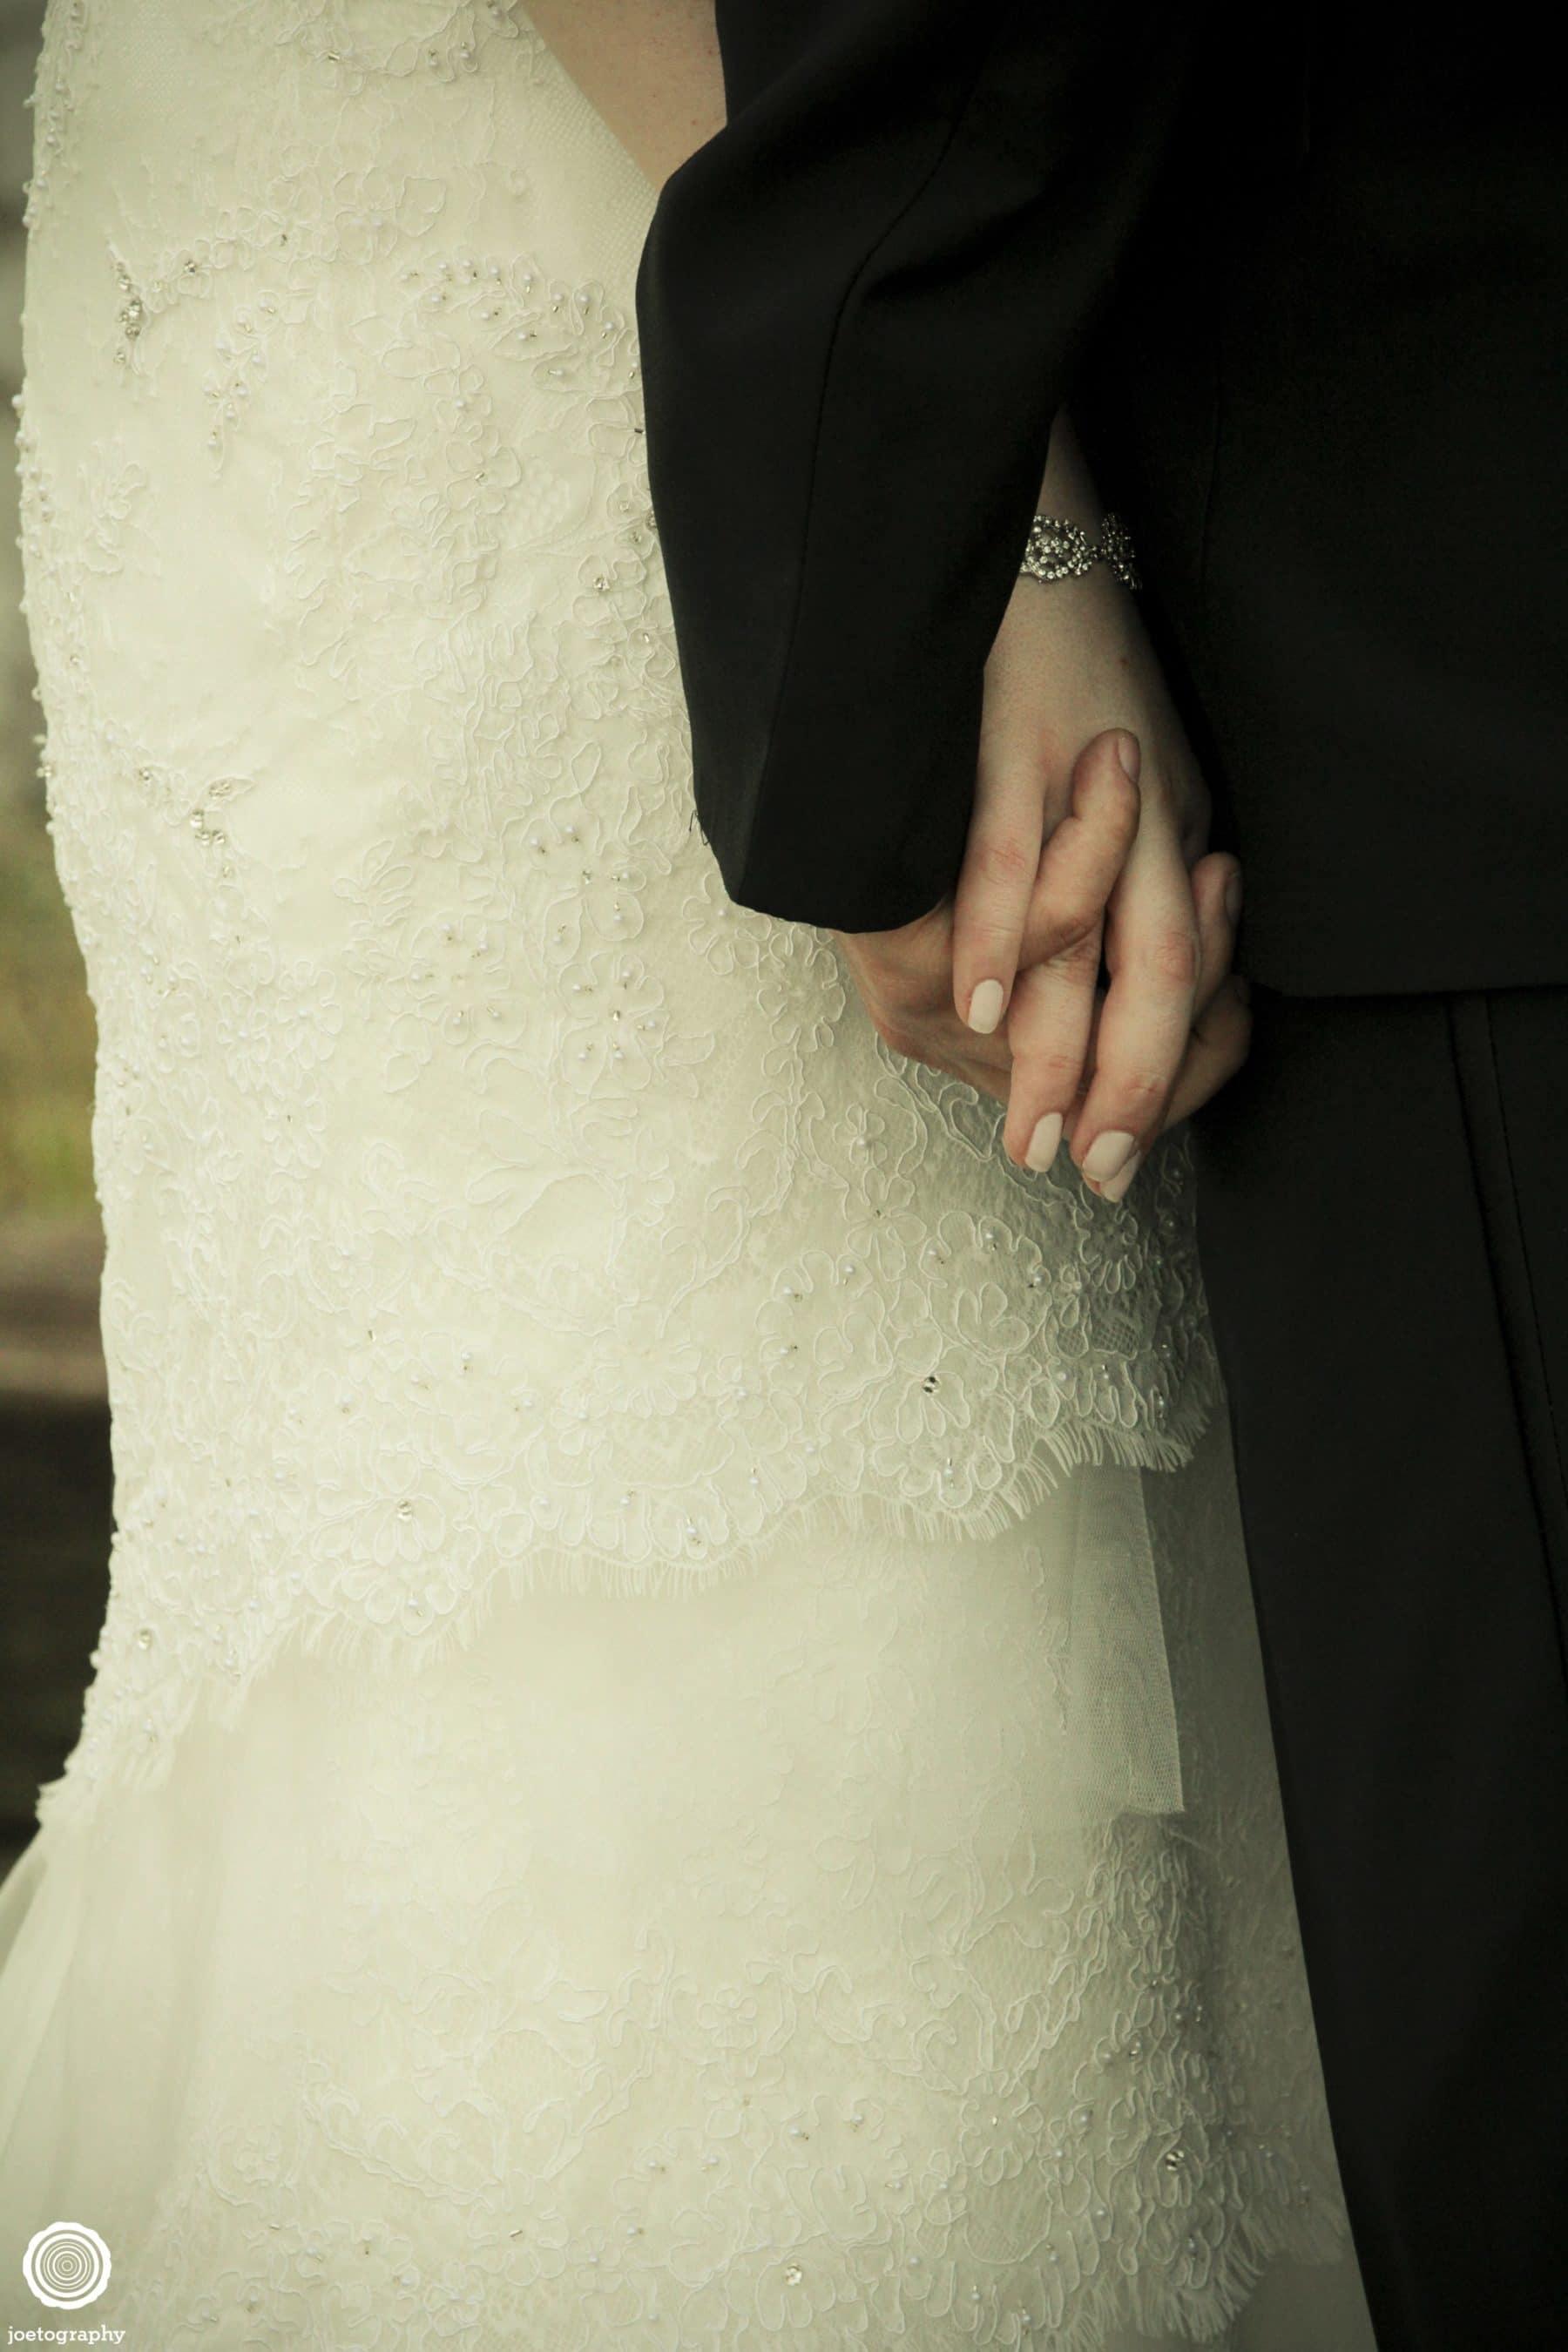 Gutwein-Wedding-Photography-Indianapolis-Indiana-210